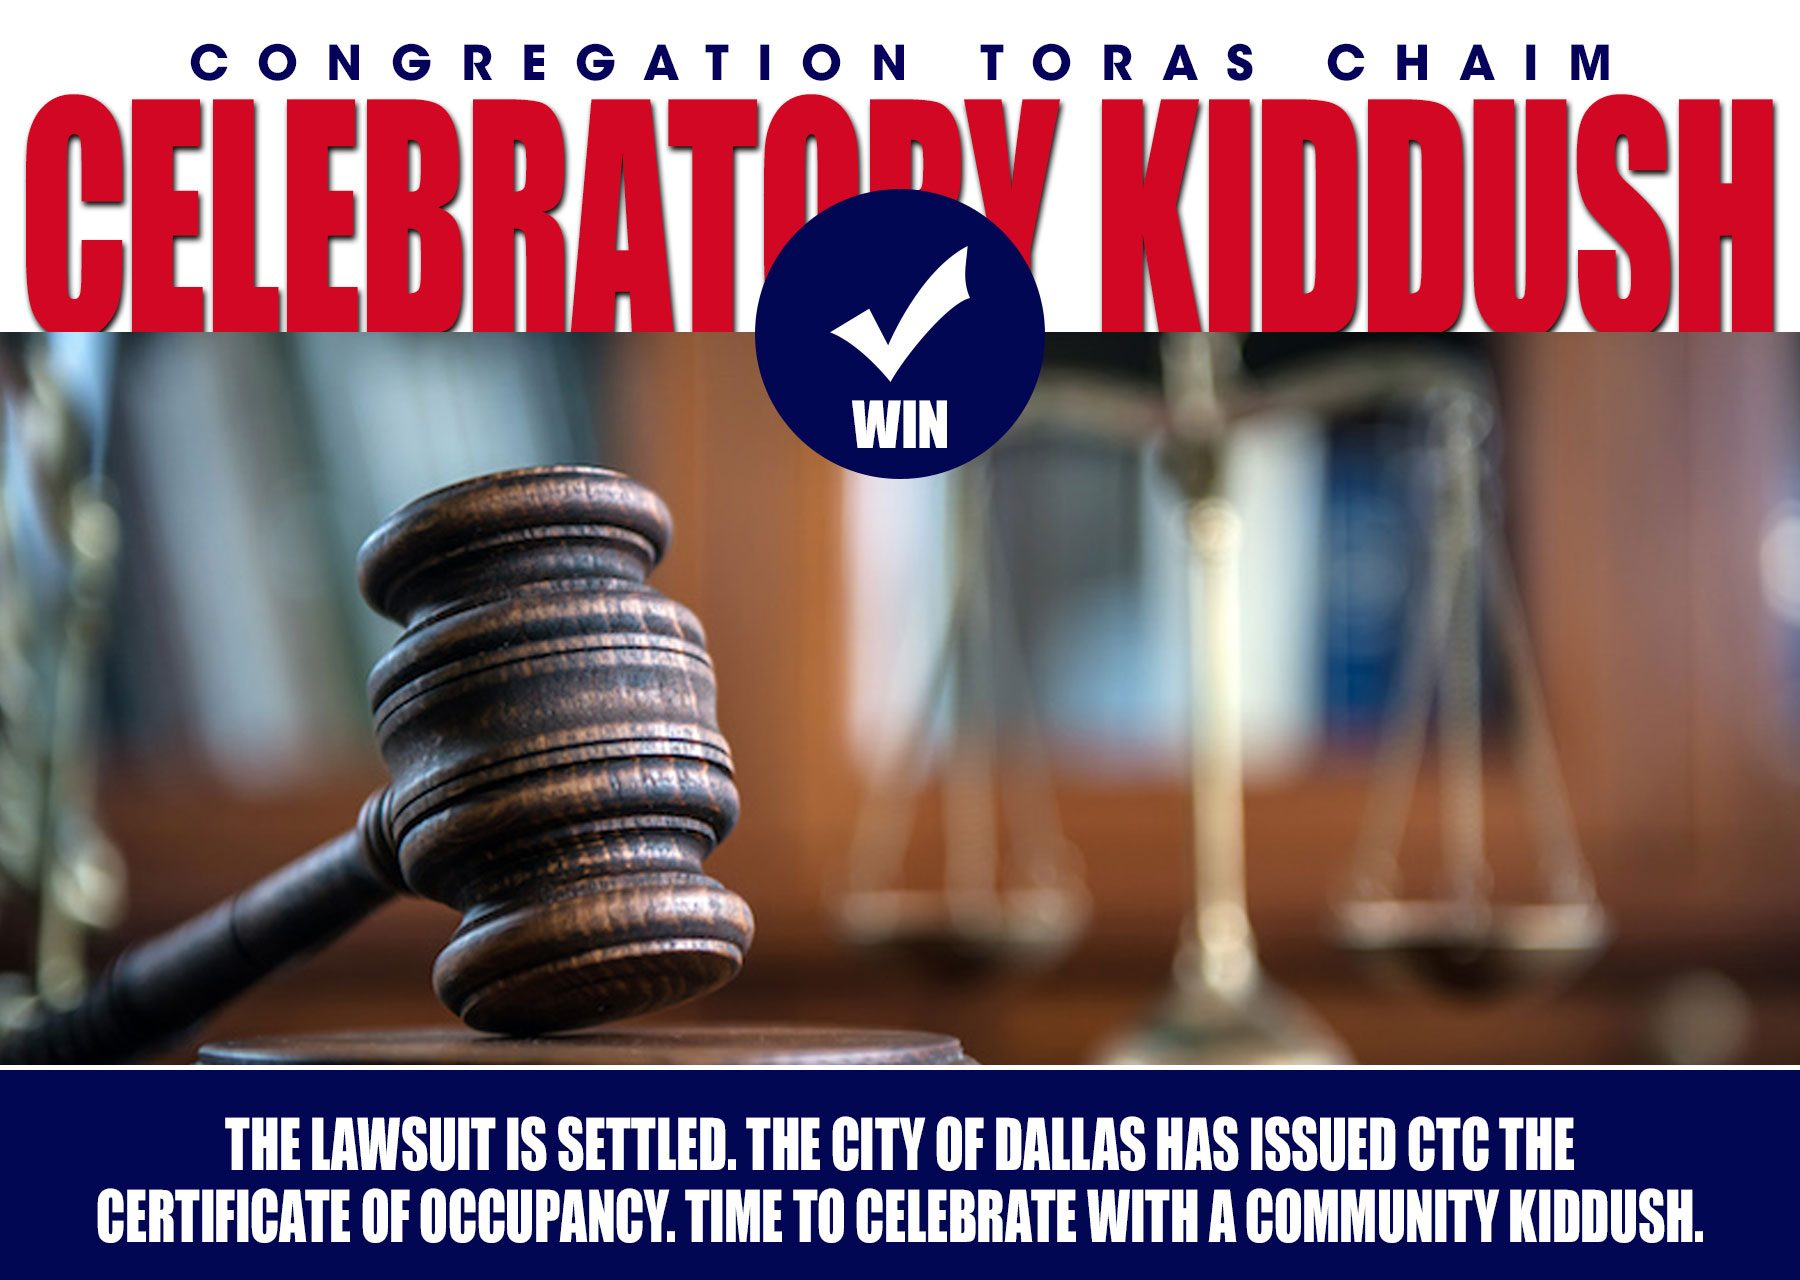 CTC Celebratory Kiddush